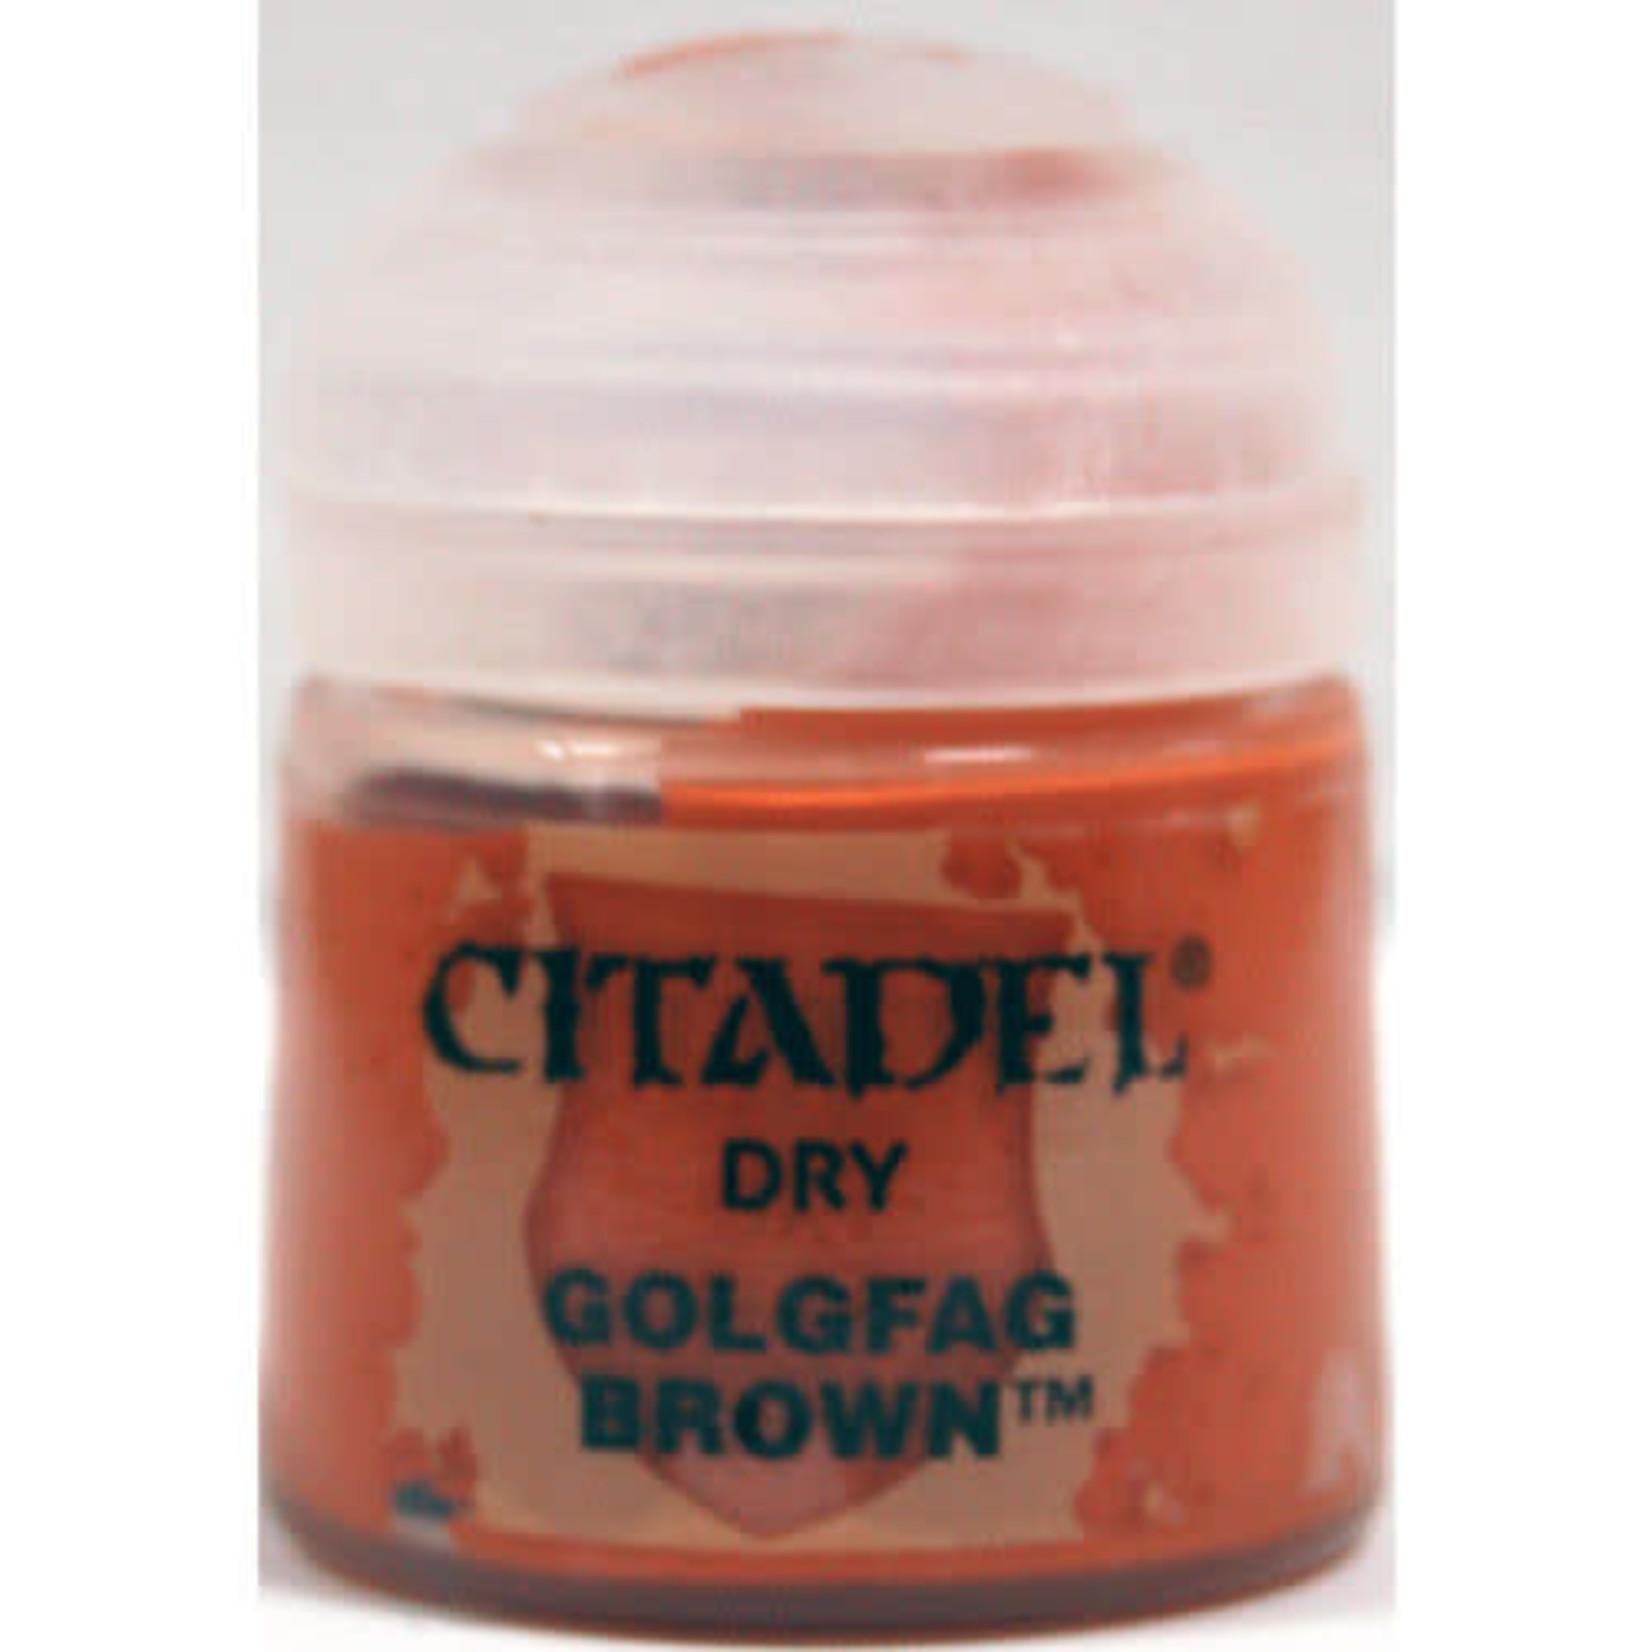 Citadel Citadel Paint - Dry: Golgfag Brown